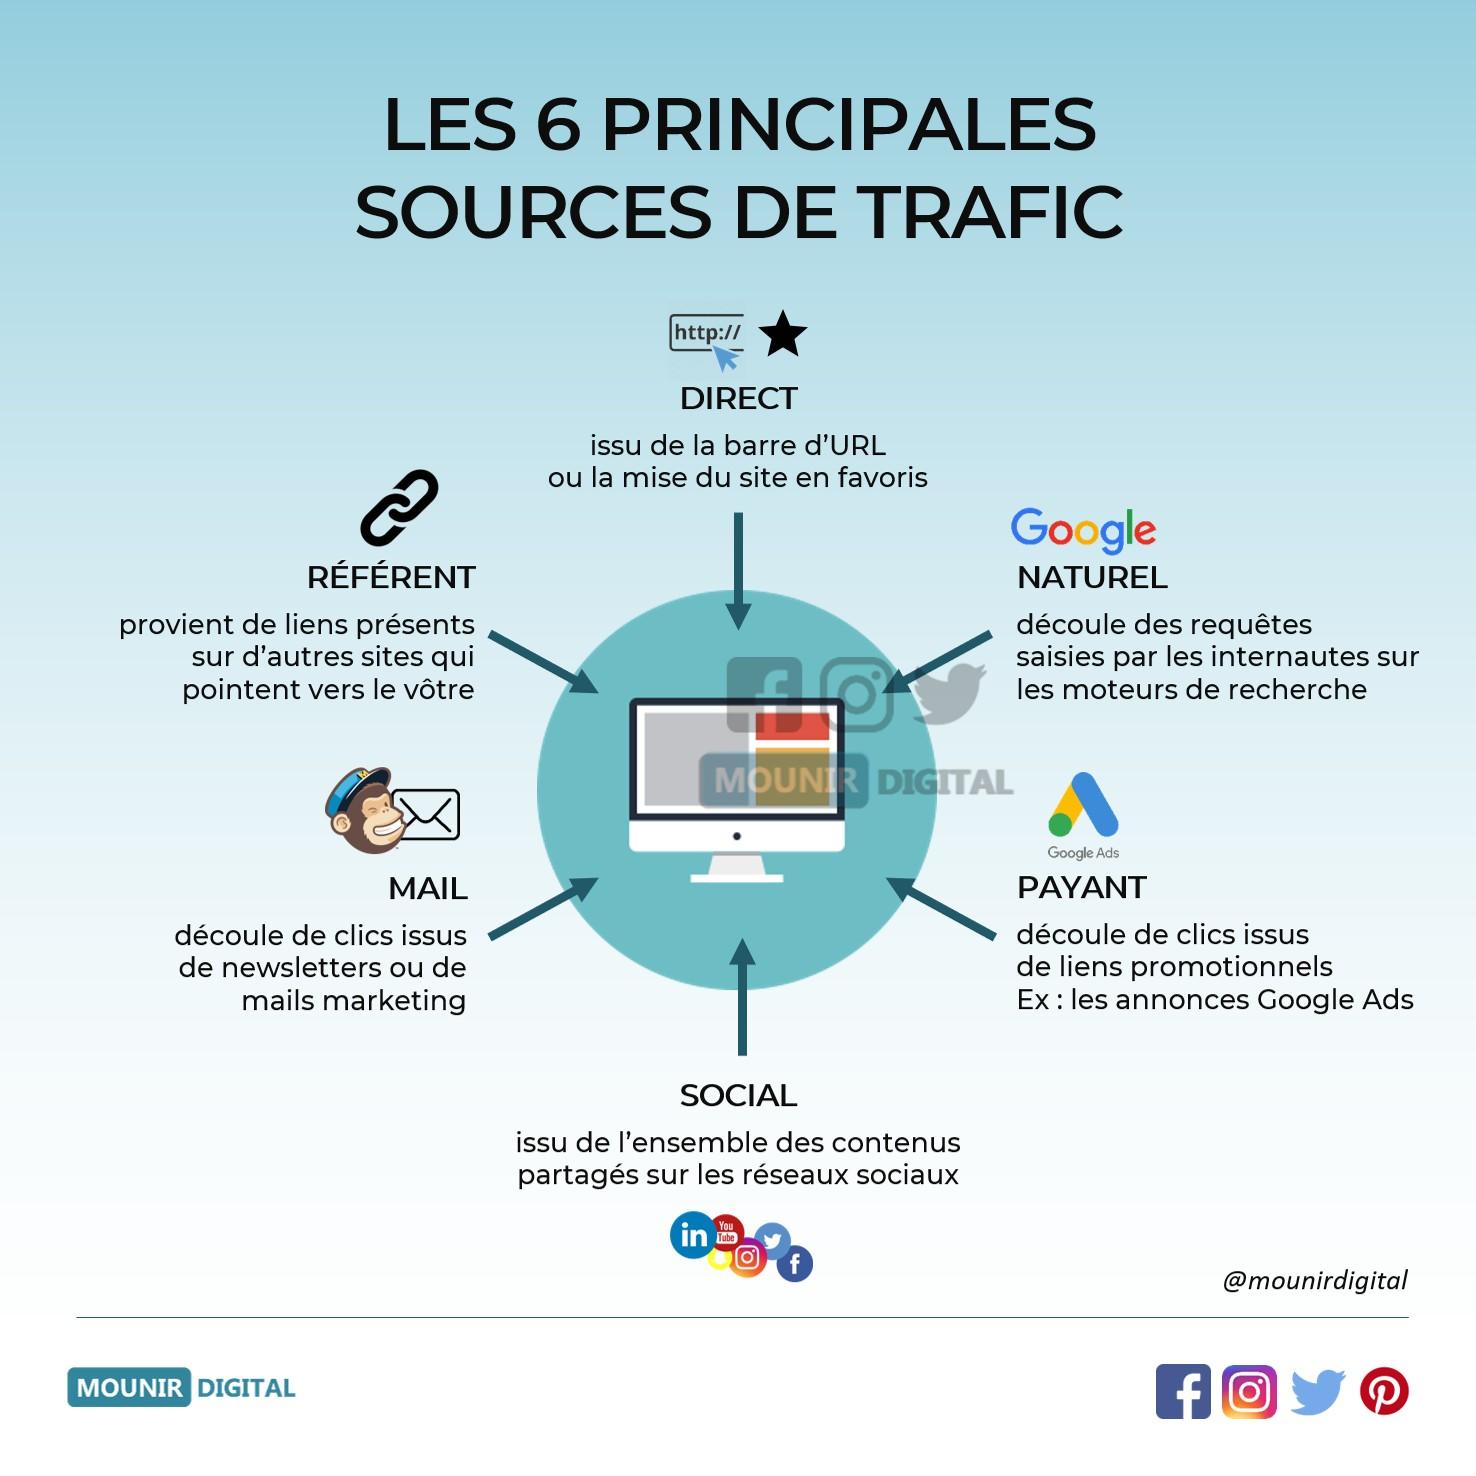 sources-trafic-principales-mounir-digital